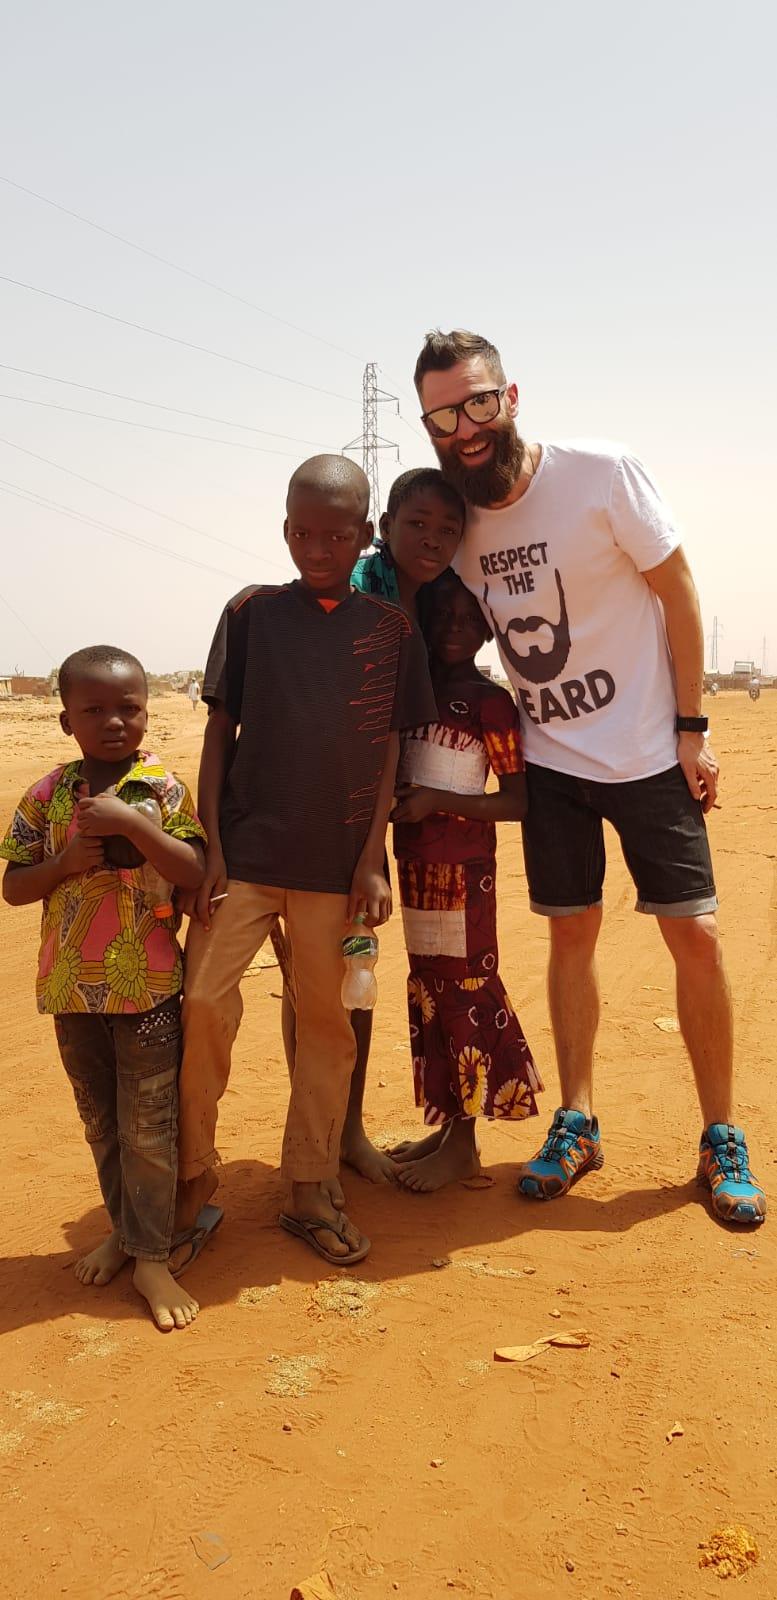 the sun rock band gianluca in africa